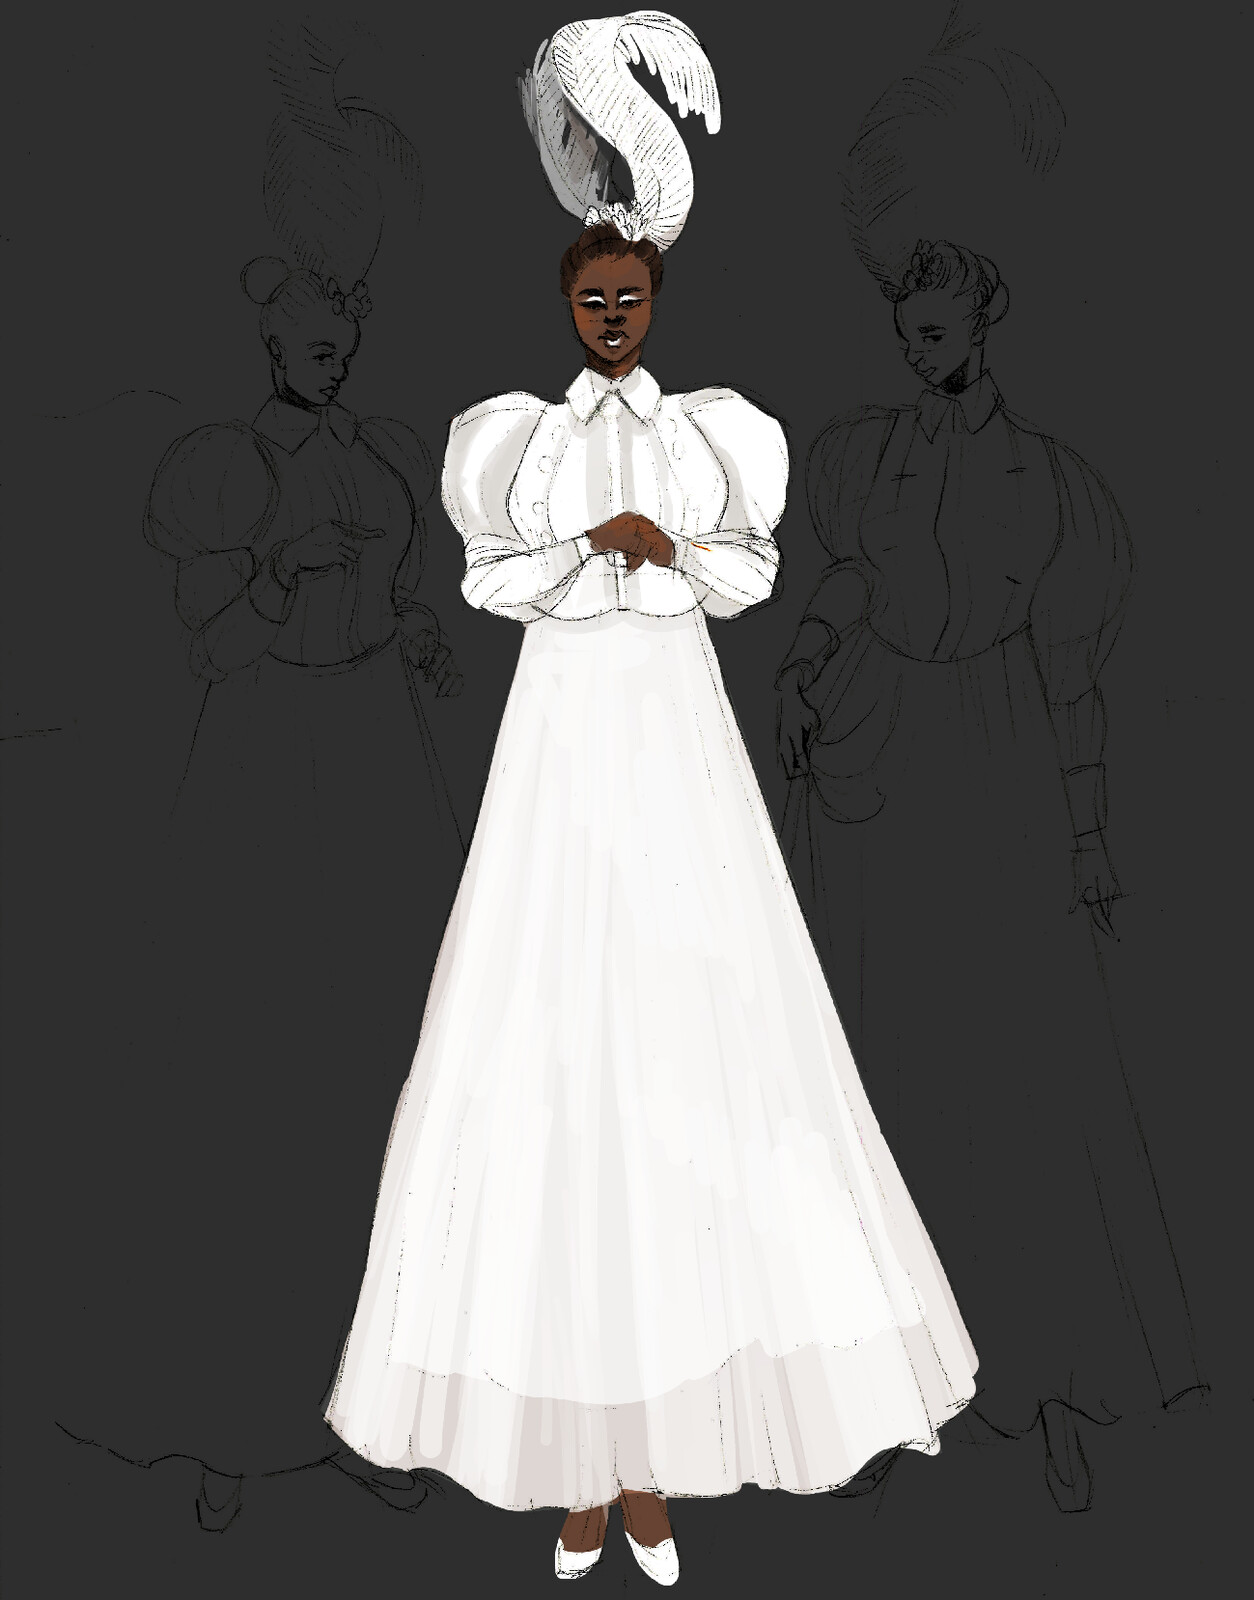 Dream Dancer: concept rendering